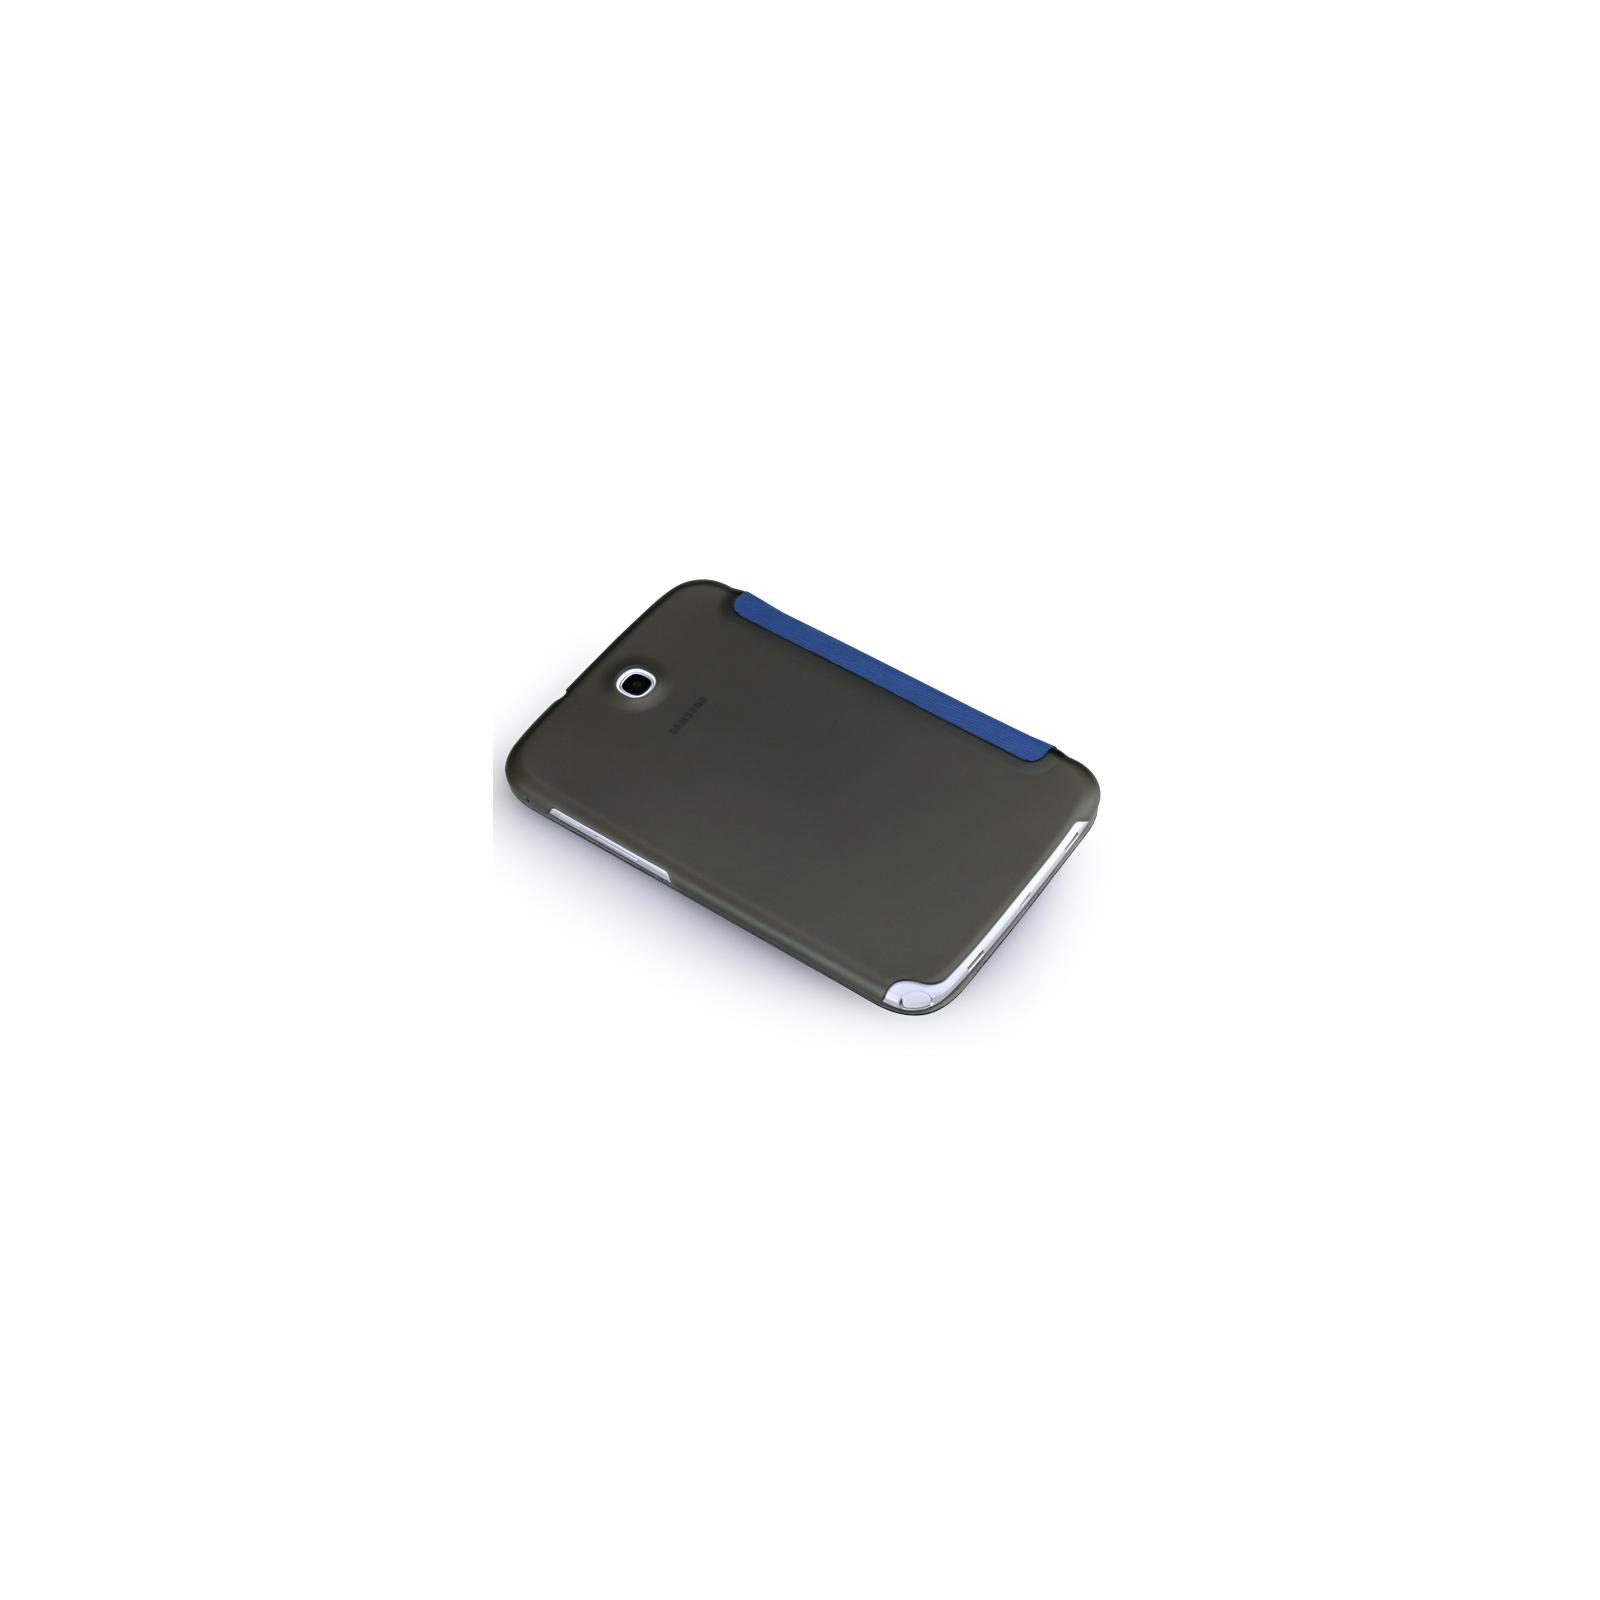 "Чехол для планшета Rock 8"" Rock Samsung Note 8.0 N5100 new elegant series lake blue (6950290628313) изображение 2"